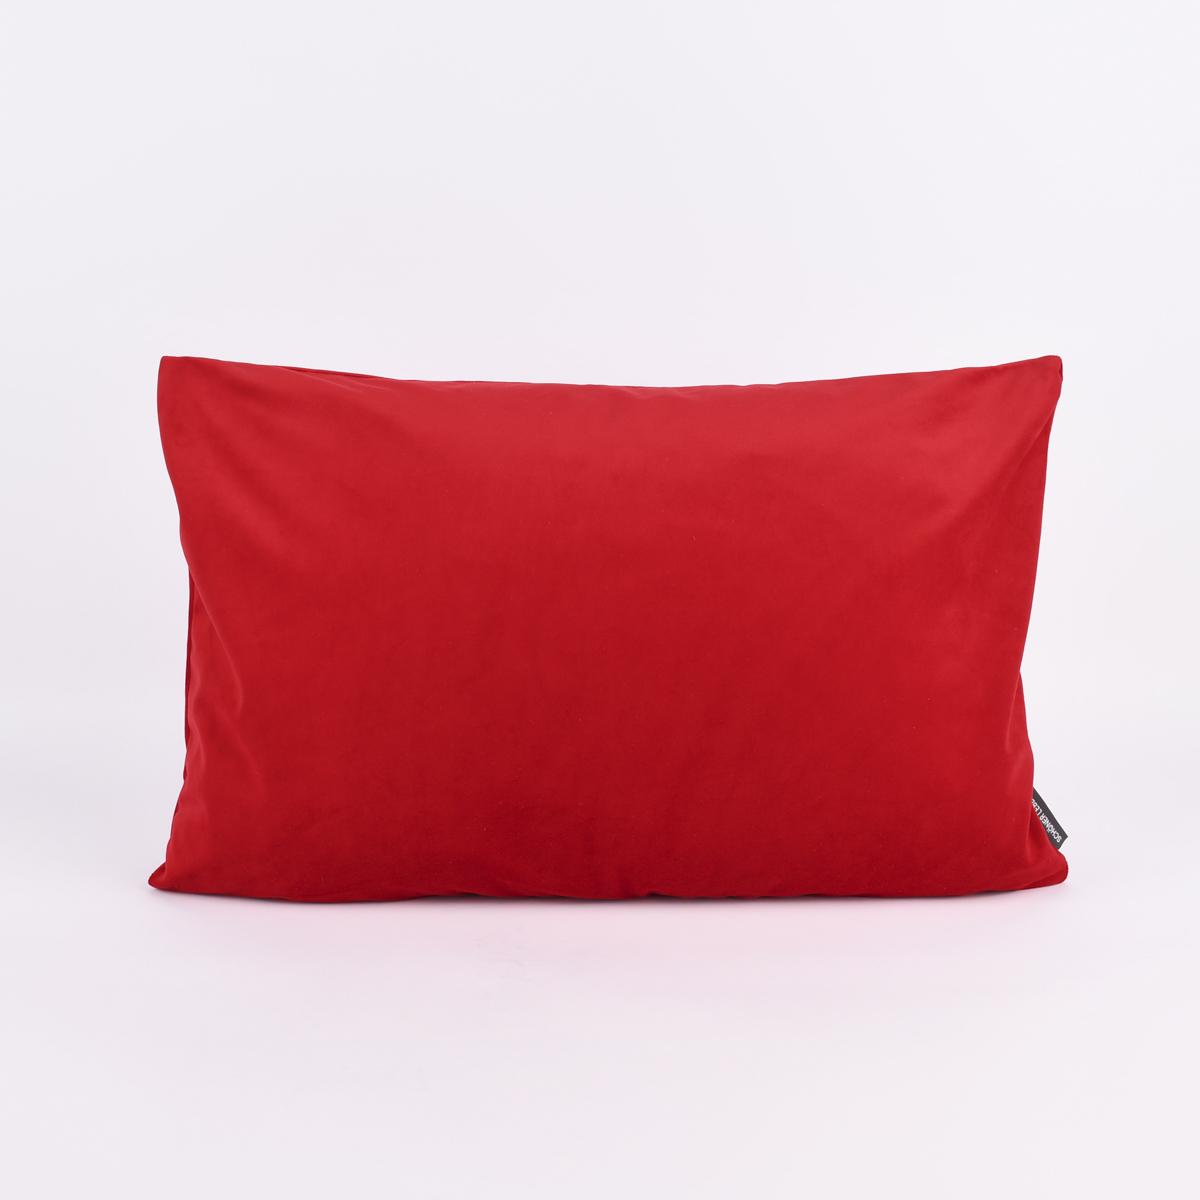 SCHÖNER LEBEN. Kissenhülle Samt einfarbig rot 40x60cm